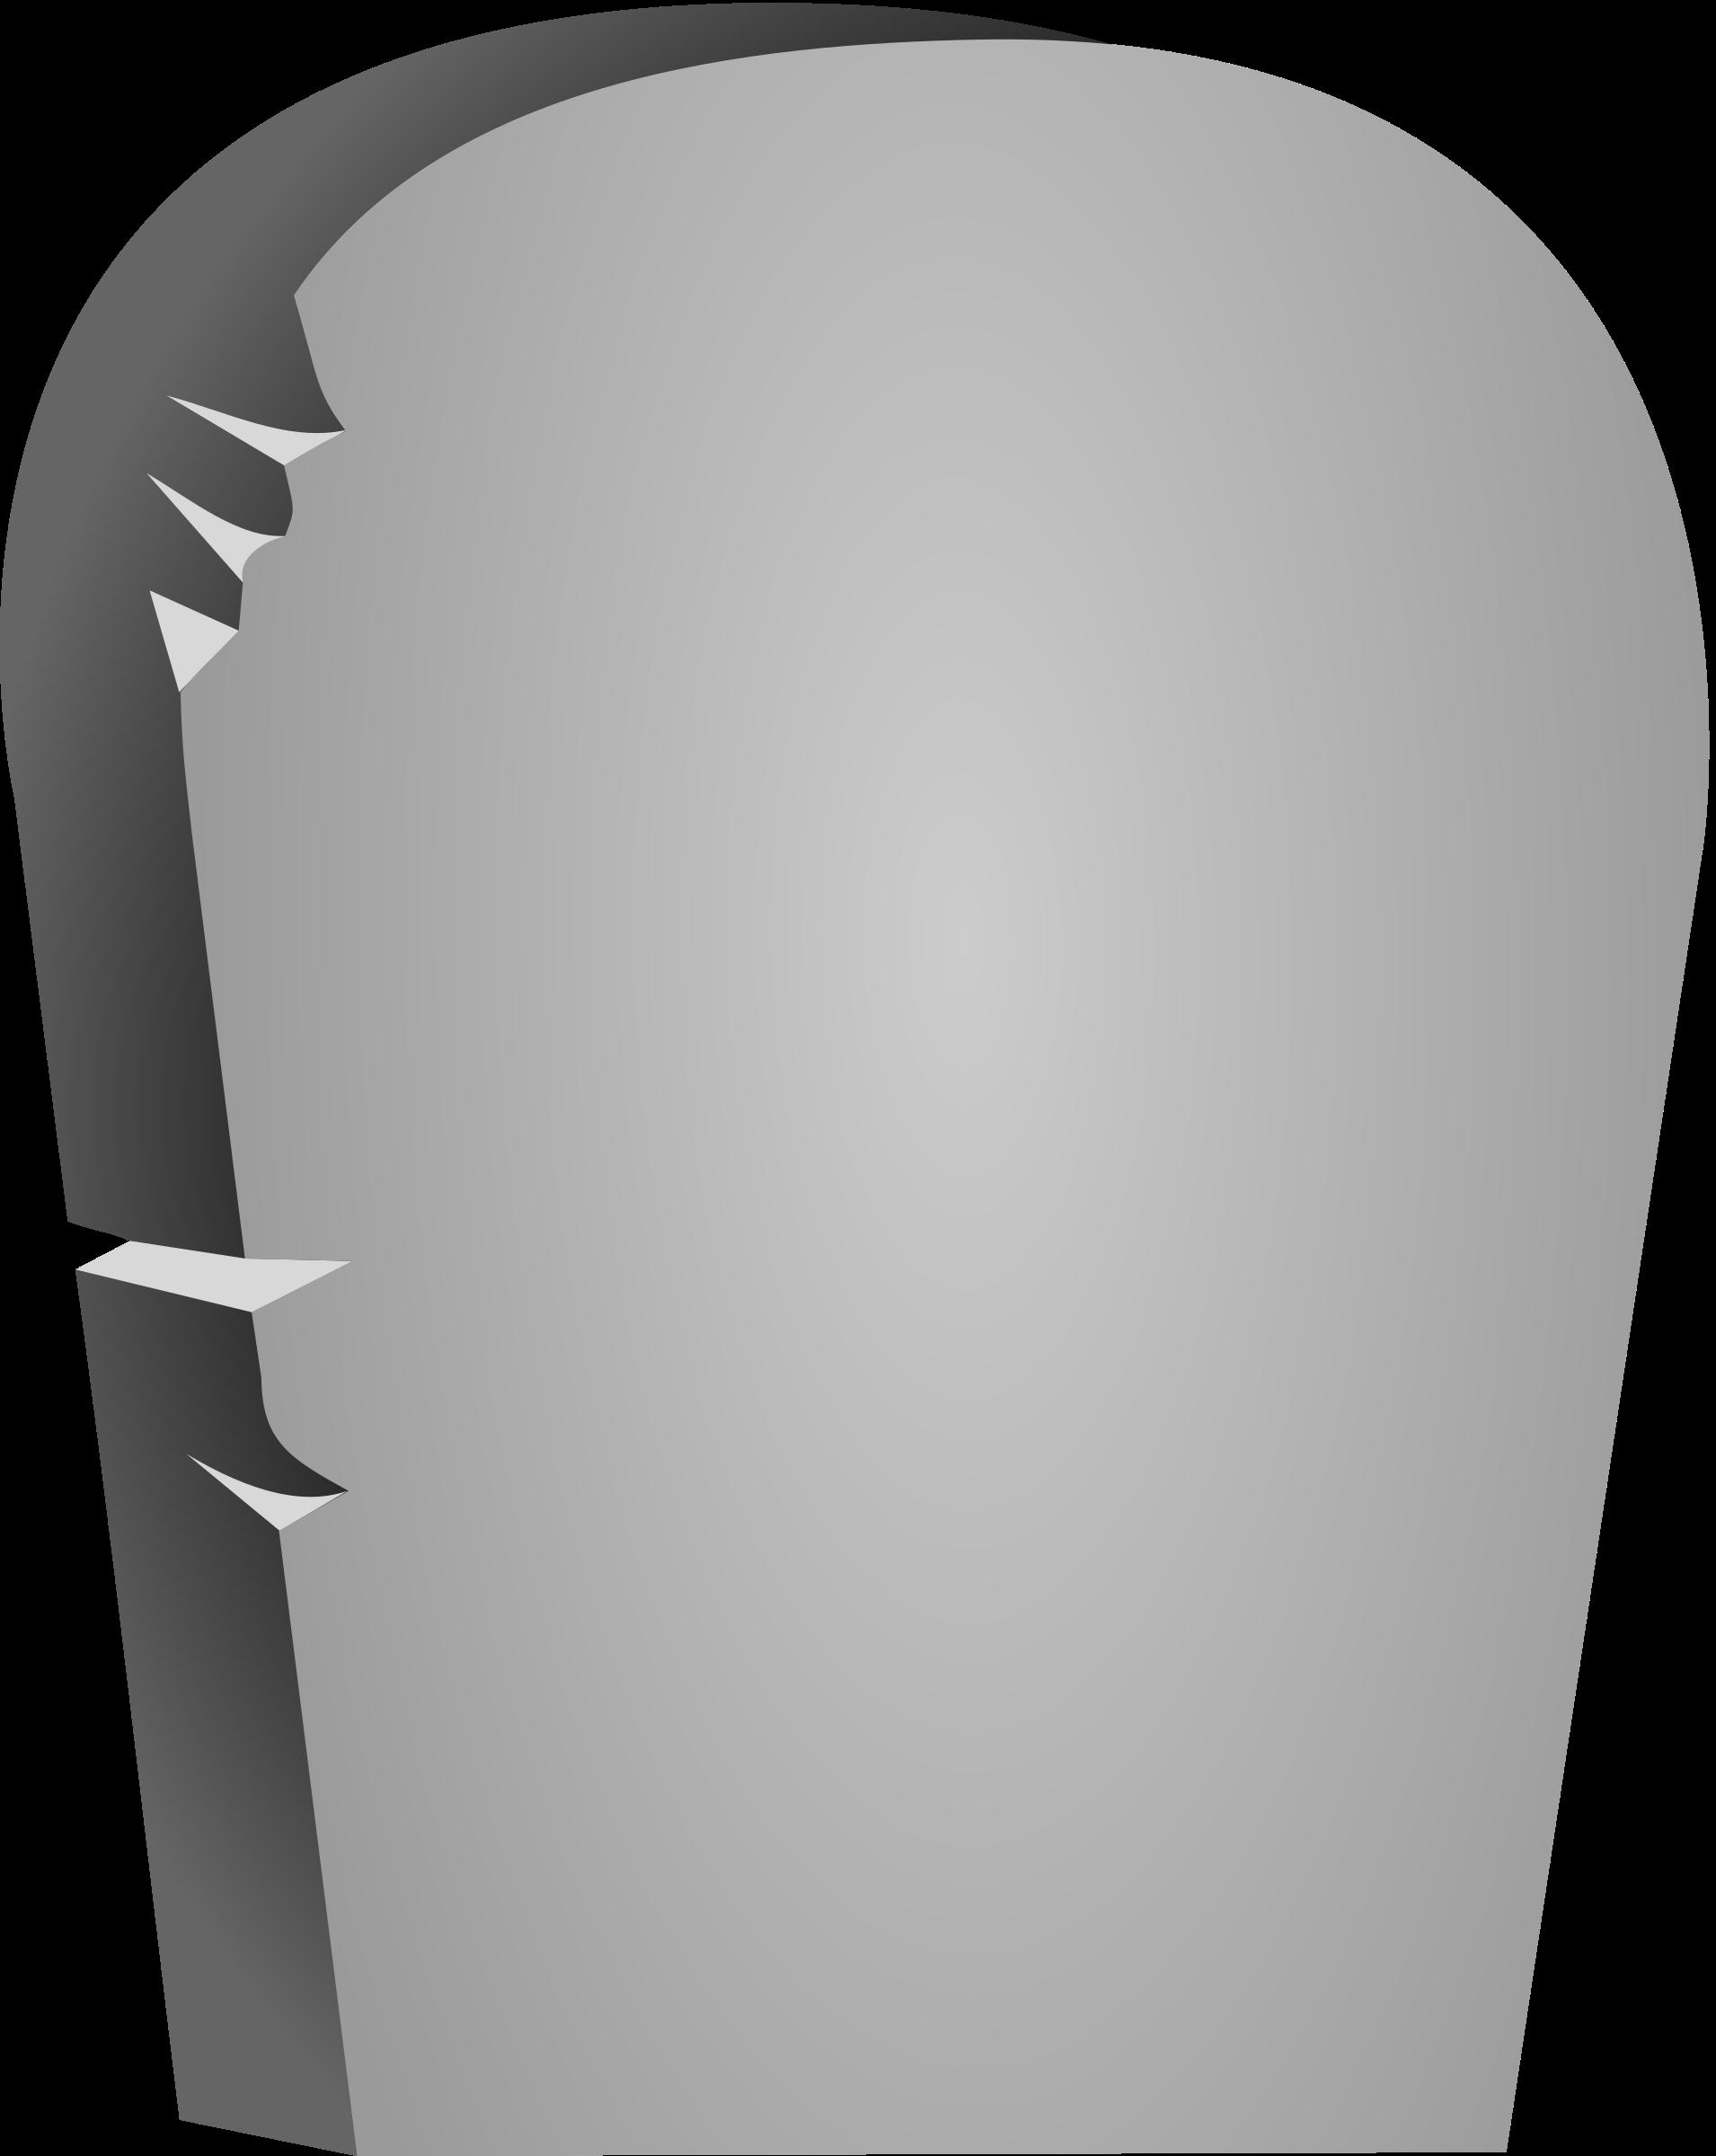 blank gravestone template